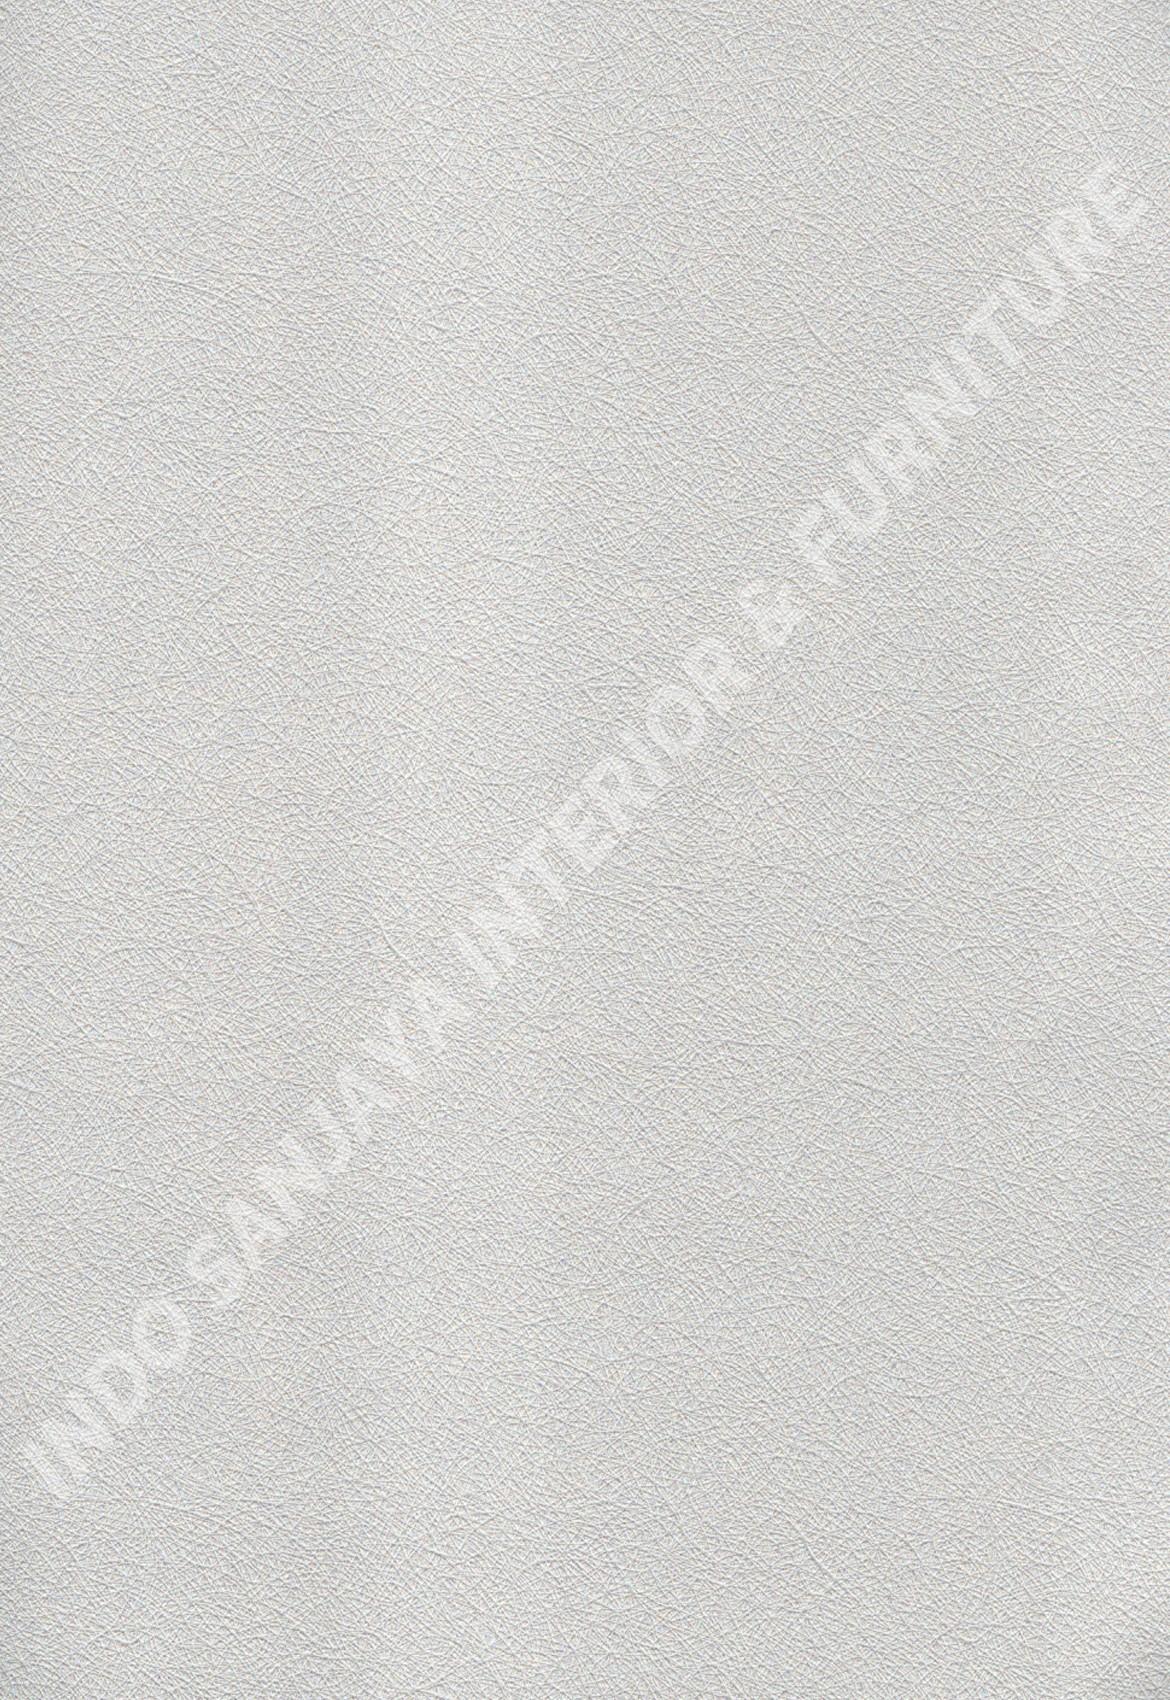 wallpaper   Wallpaper Minimalis Polos 83129-1:83129-1 corak  warna